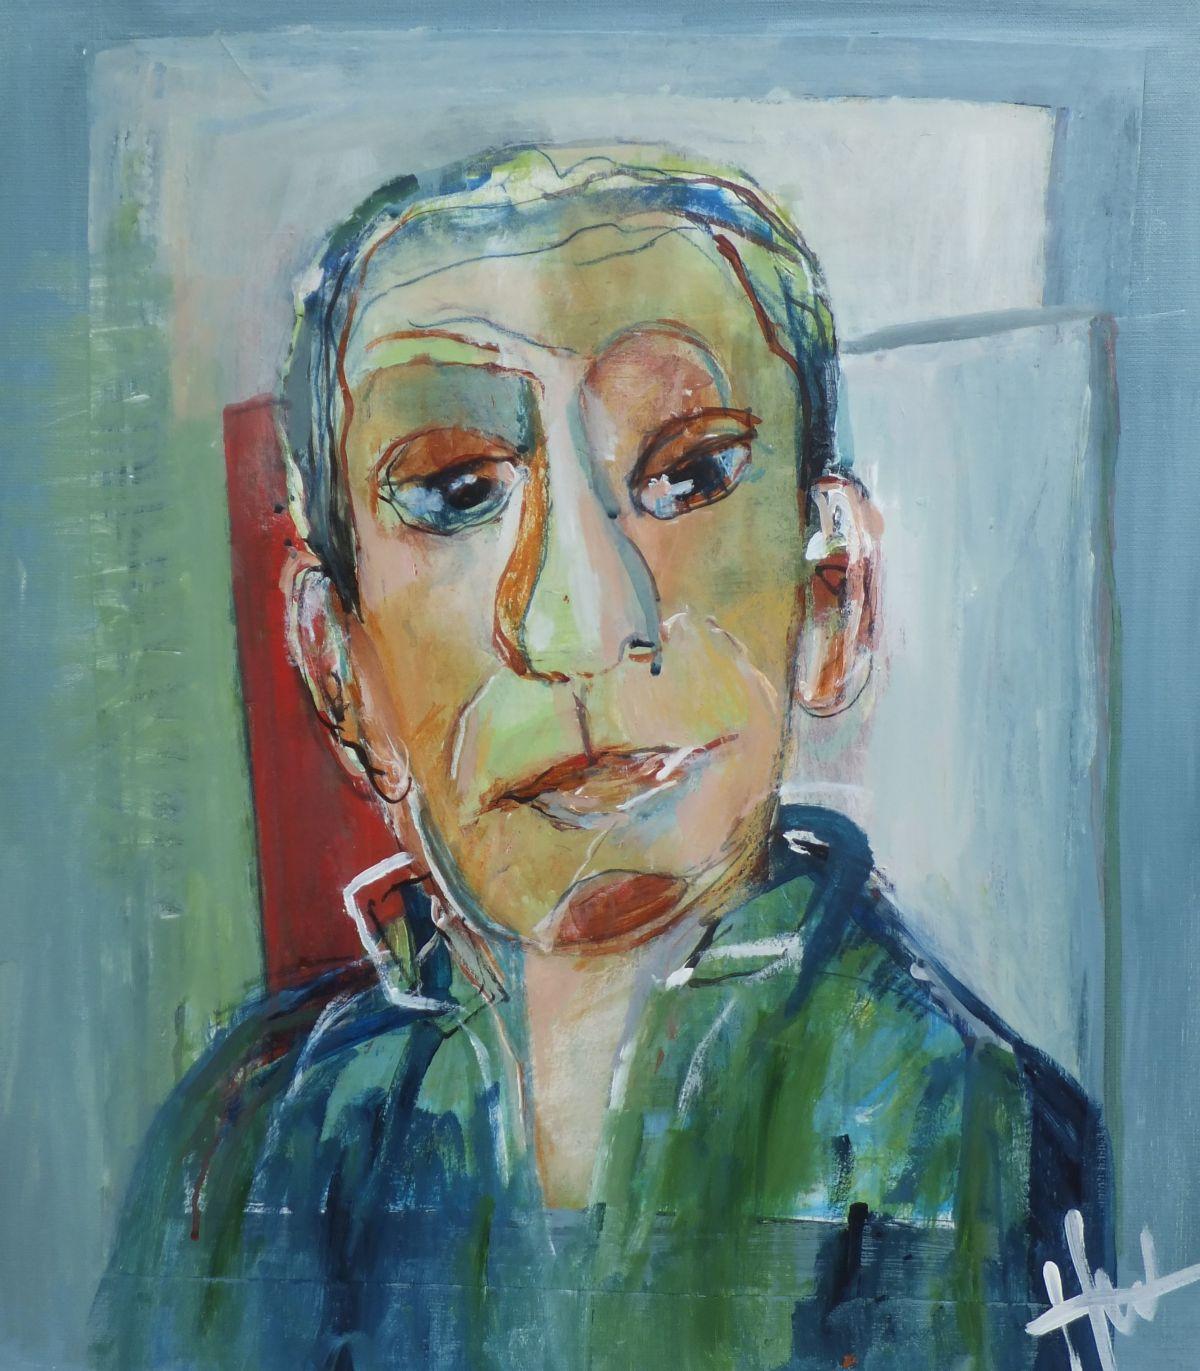 Kunst: Dwalende geest van kunstenaar Heleen Wilke